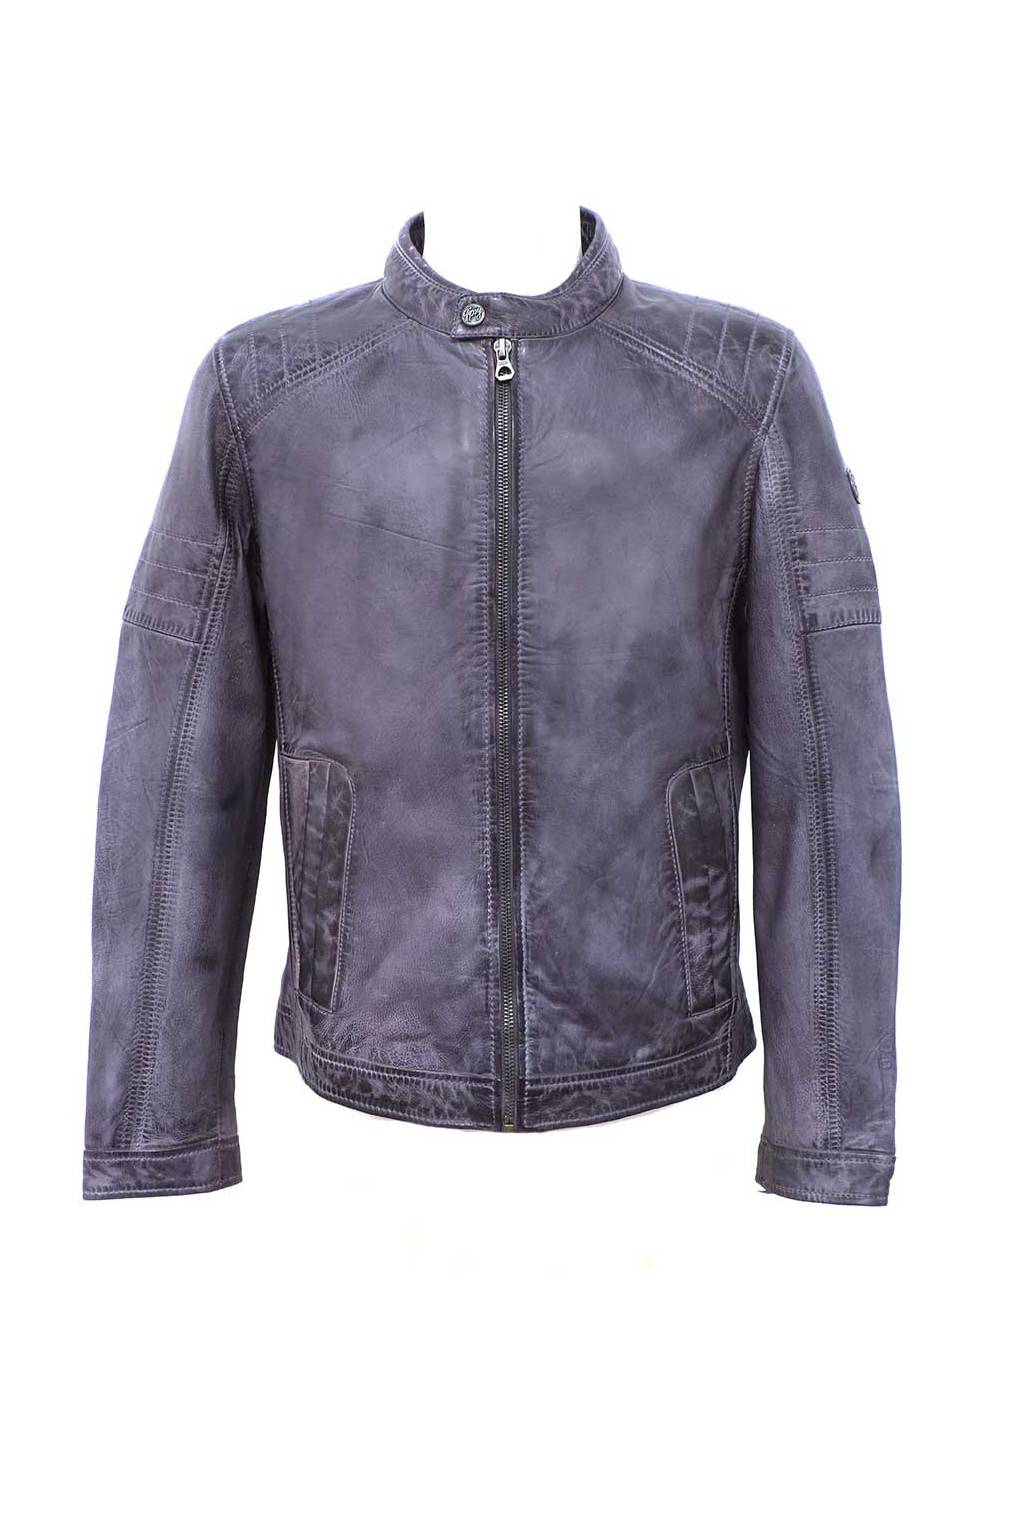 adidas goodyear leather jacket